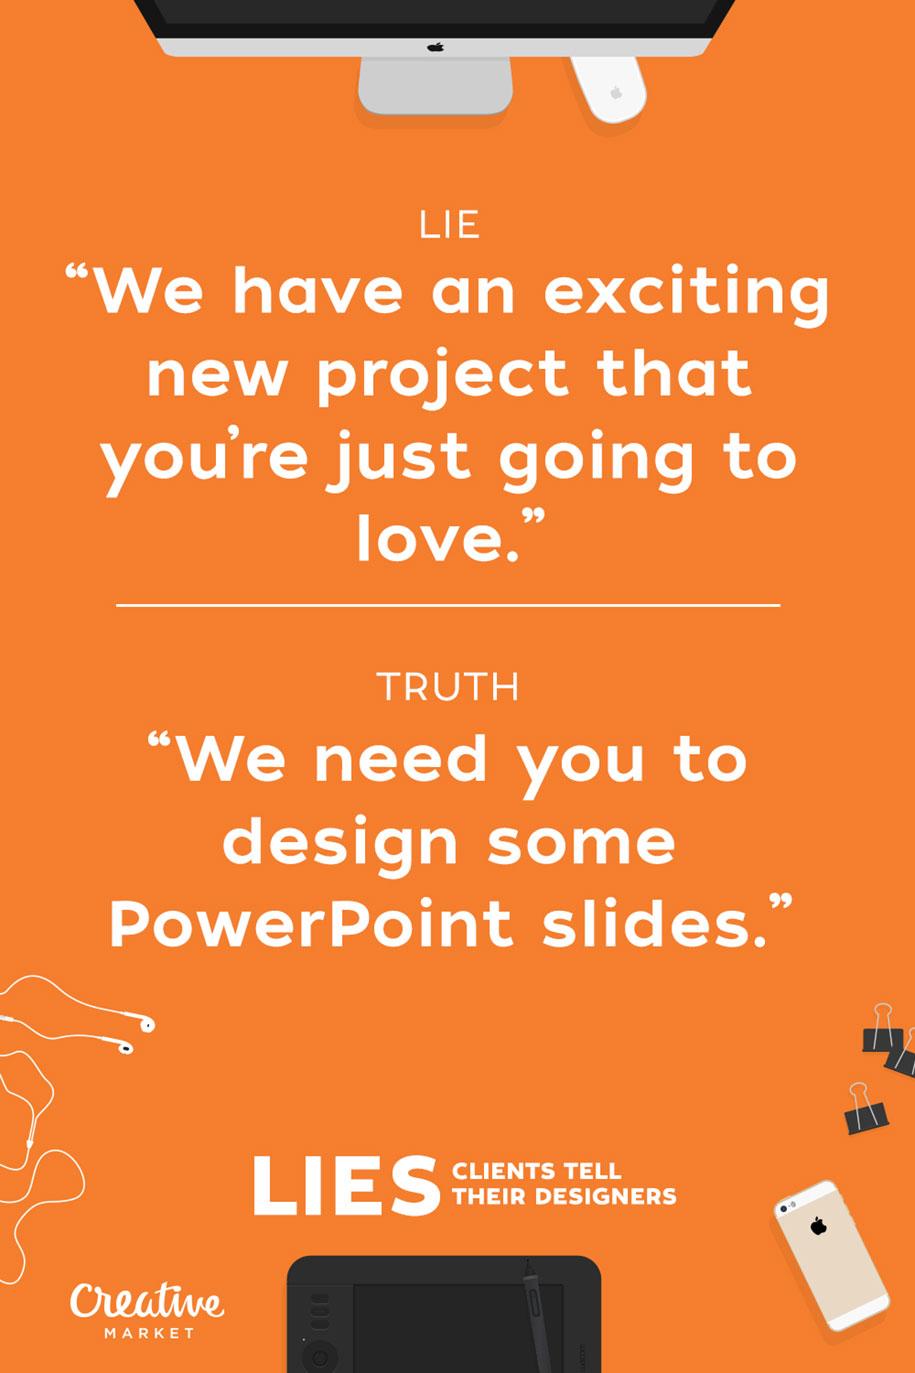 15-lies-clients-tell-designers-joshua-johnson-creative-market-7